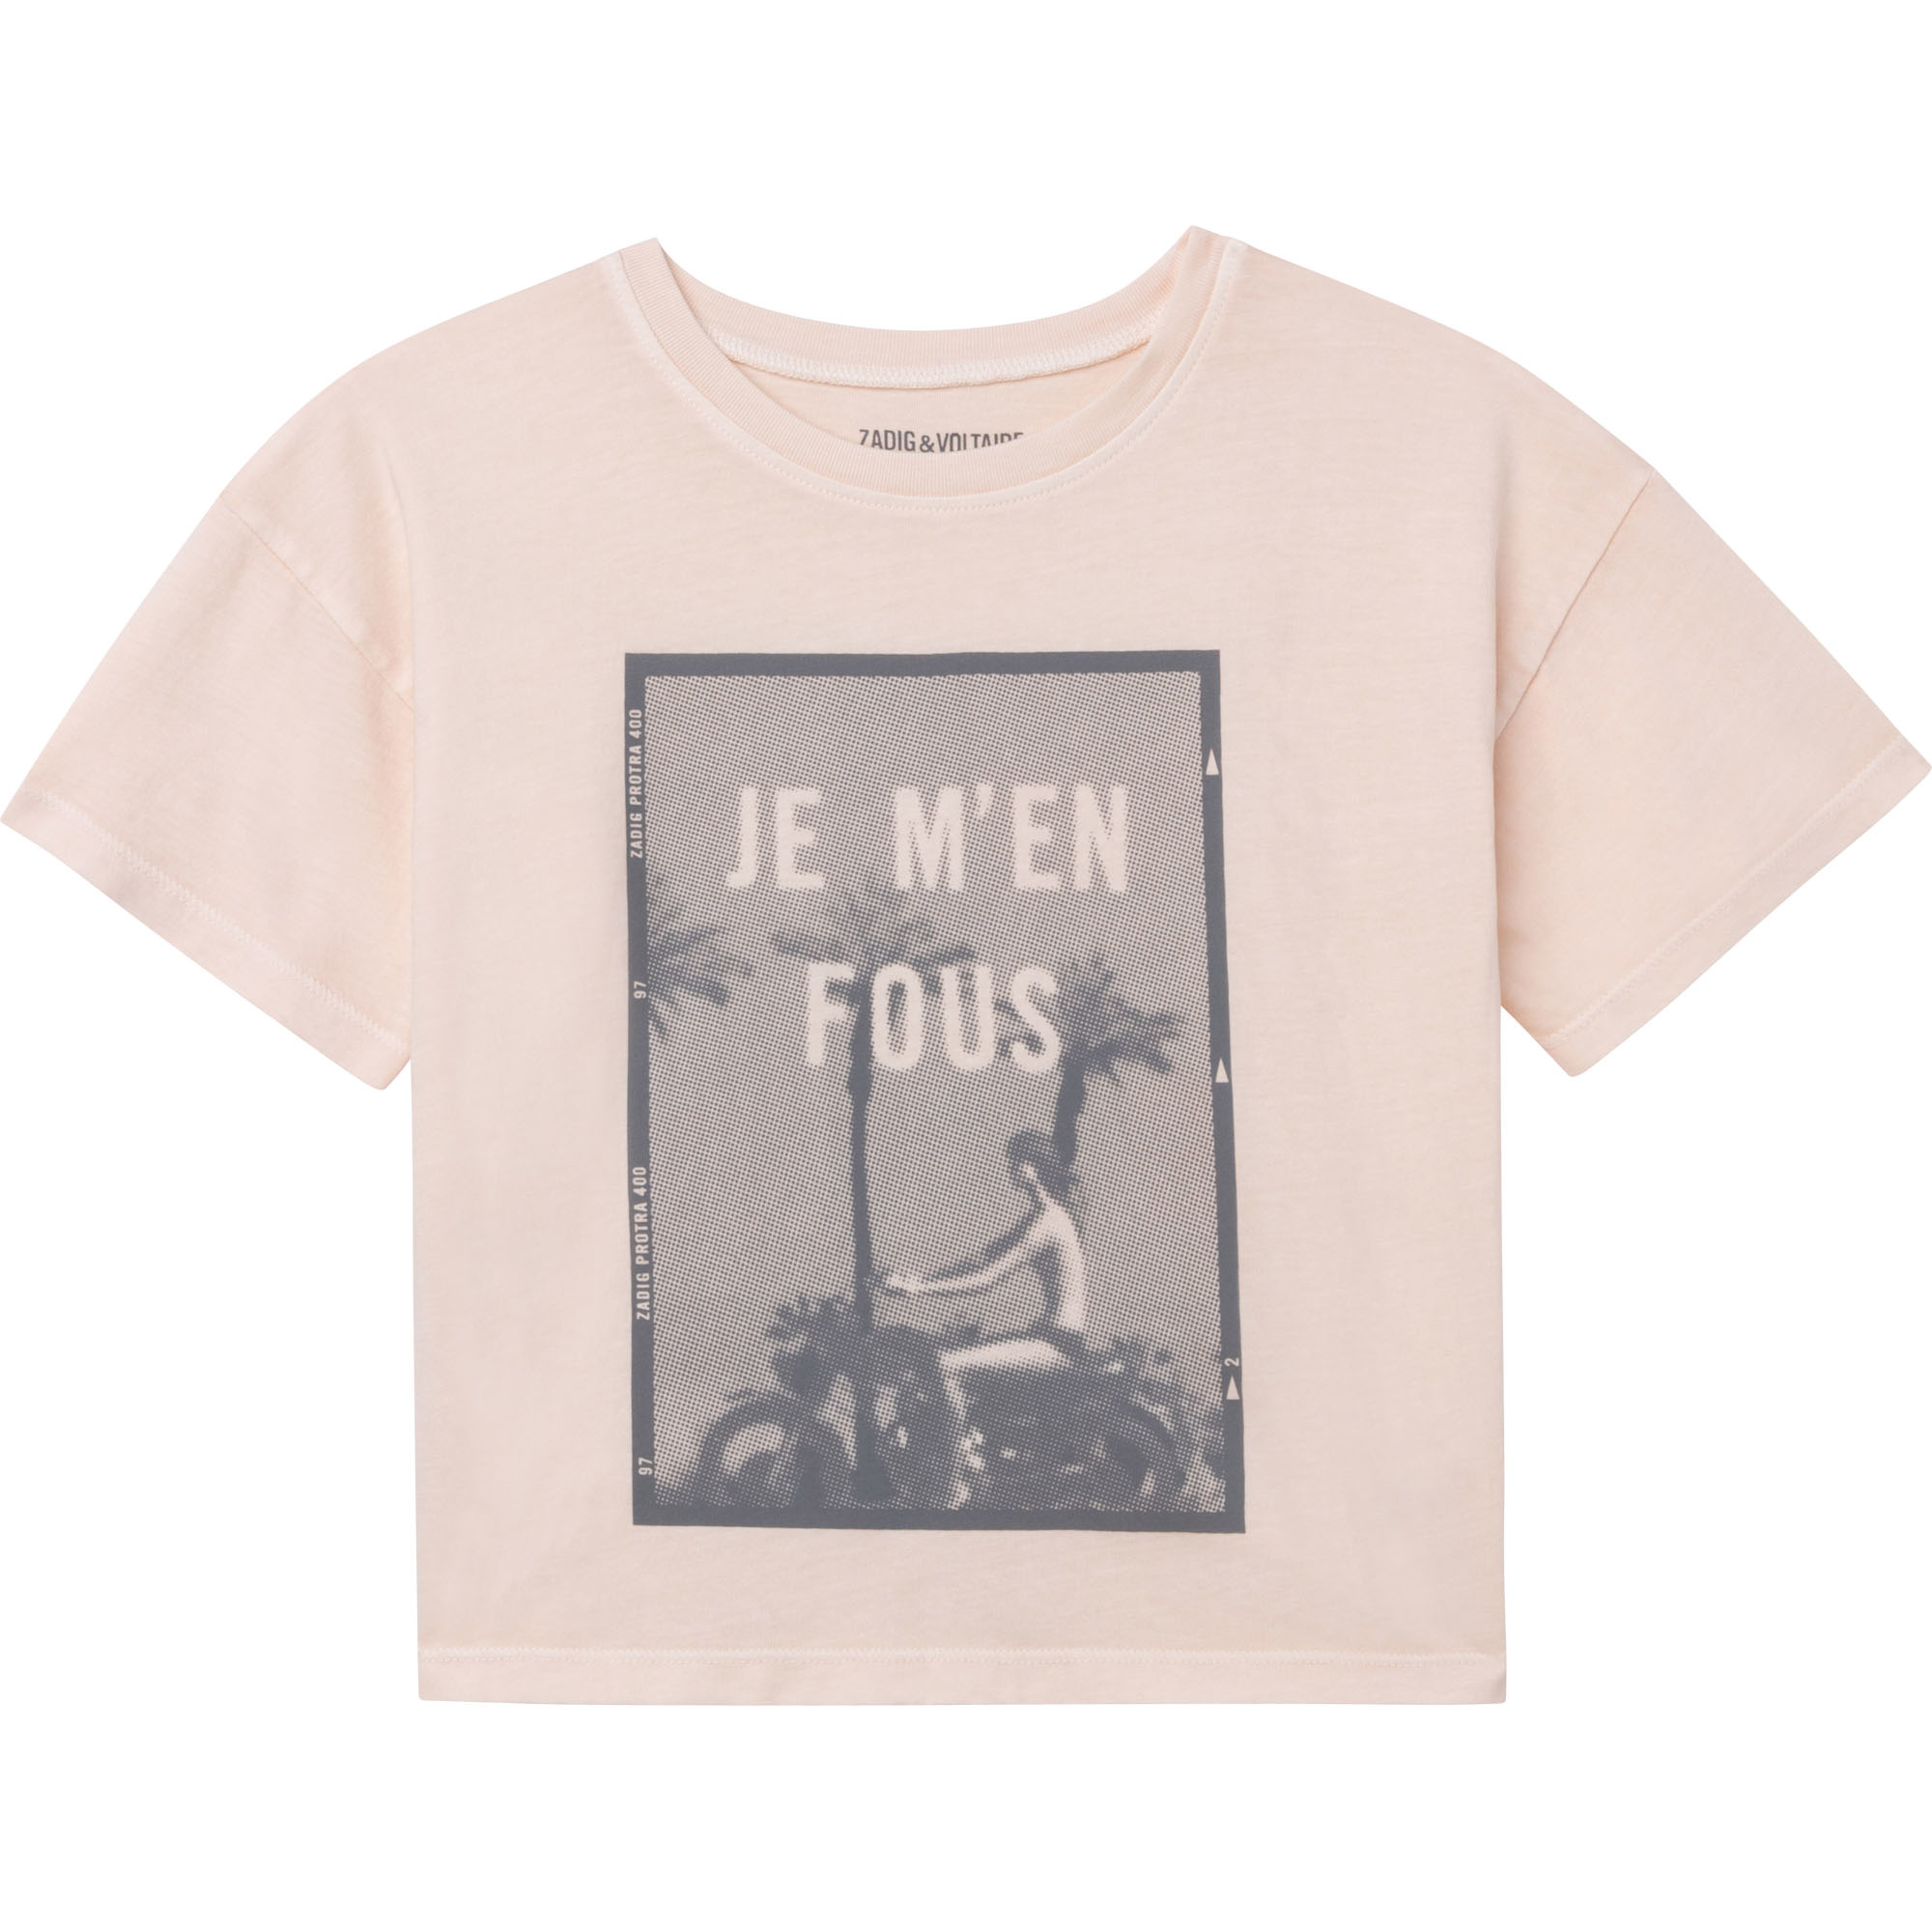 ZADIG&VOLTAIRE t-shirt manches courtes-1